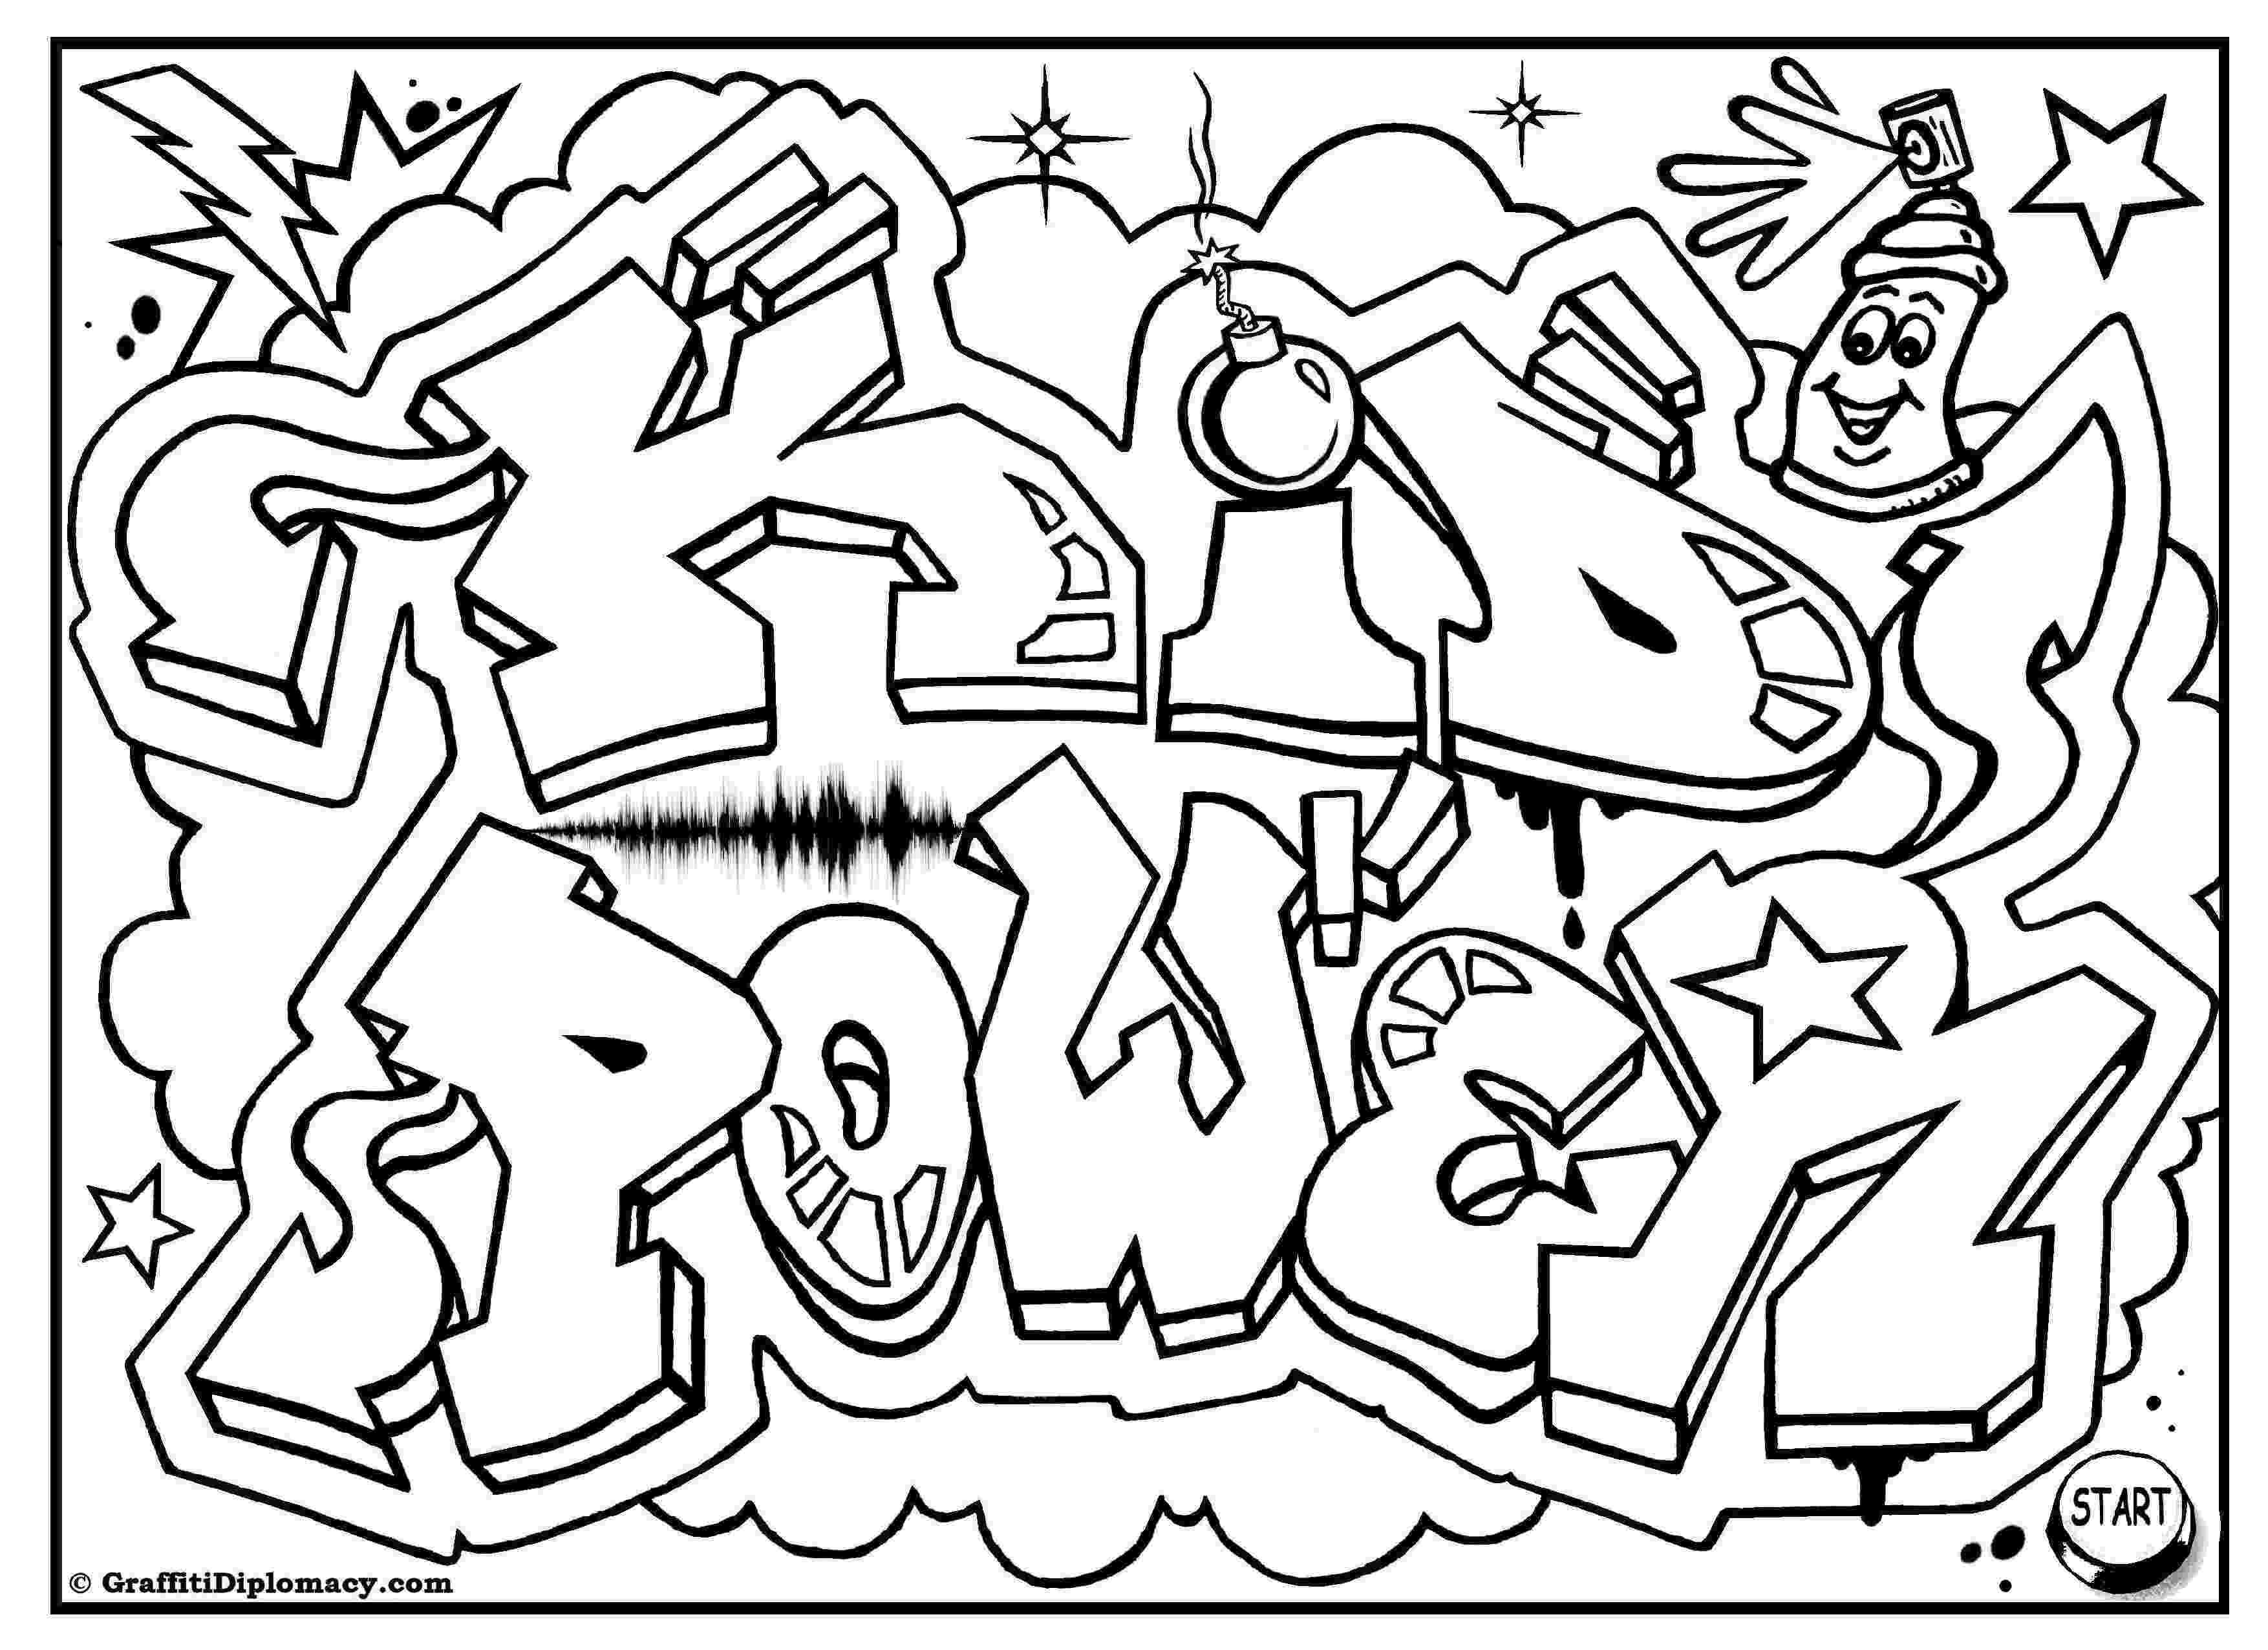 graffiti coloring expres graffiti coloring page free printable coloring pages coloring graffiti